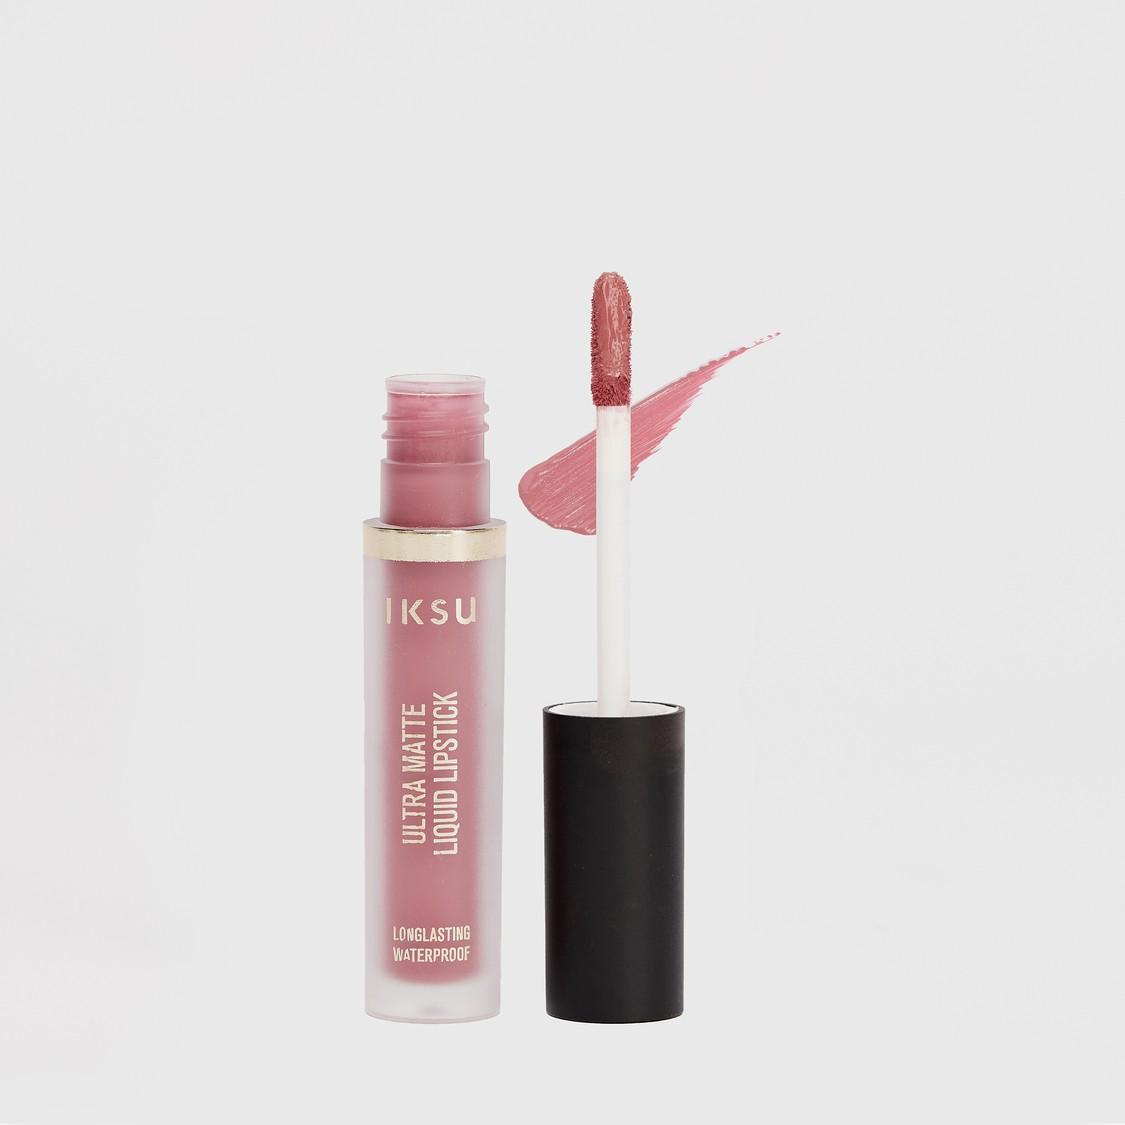 IKSU Ultra Matte Liquid Lipstick